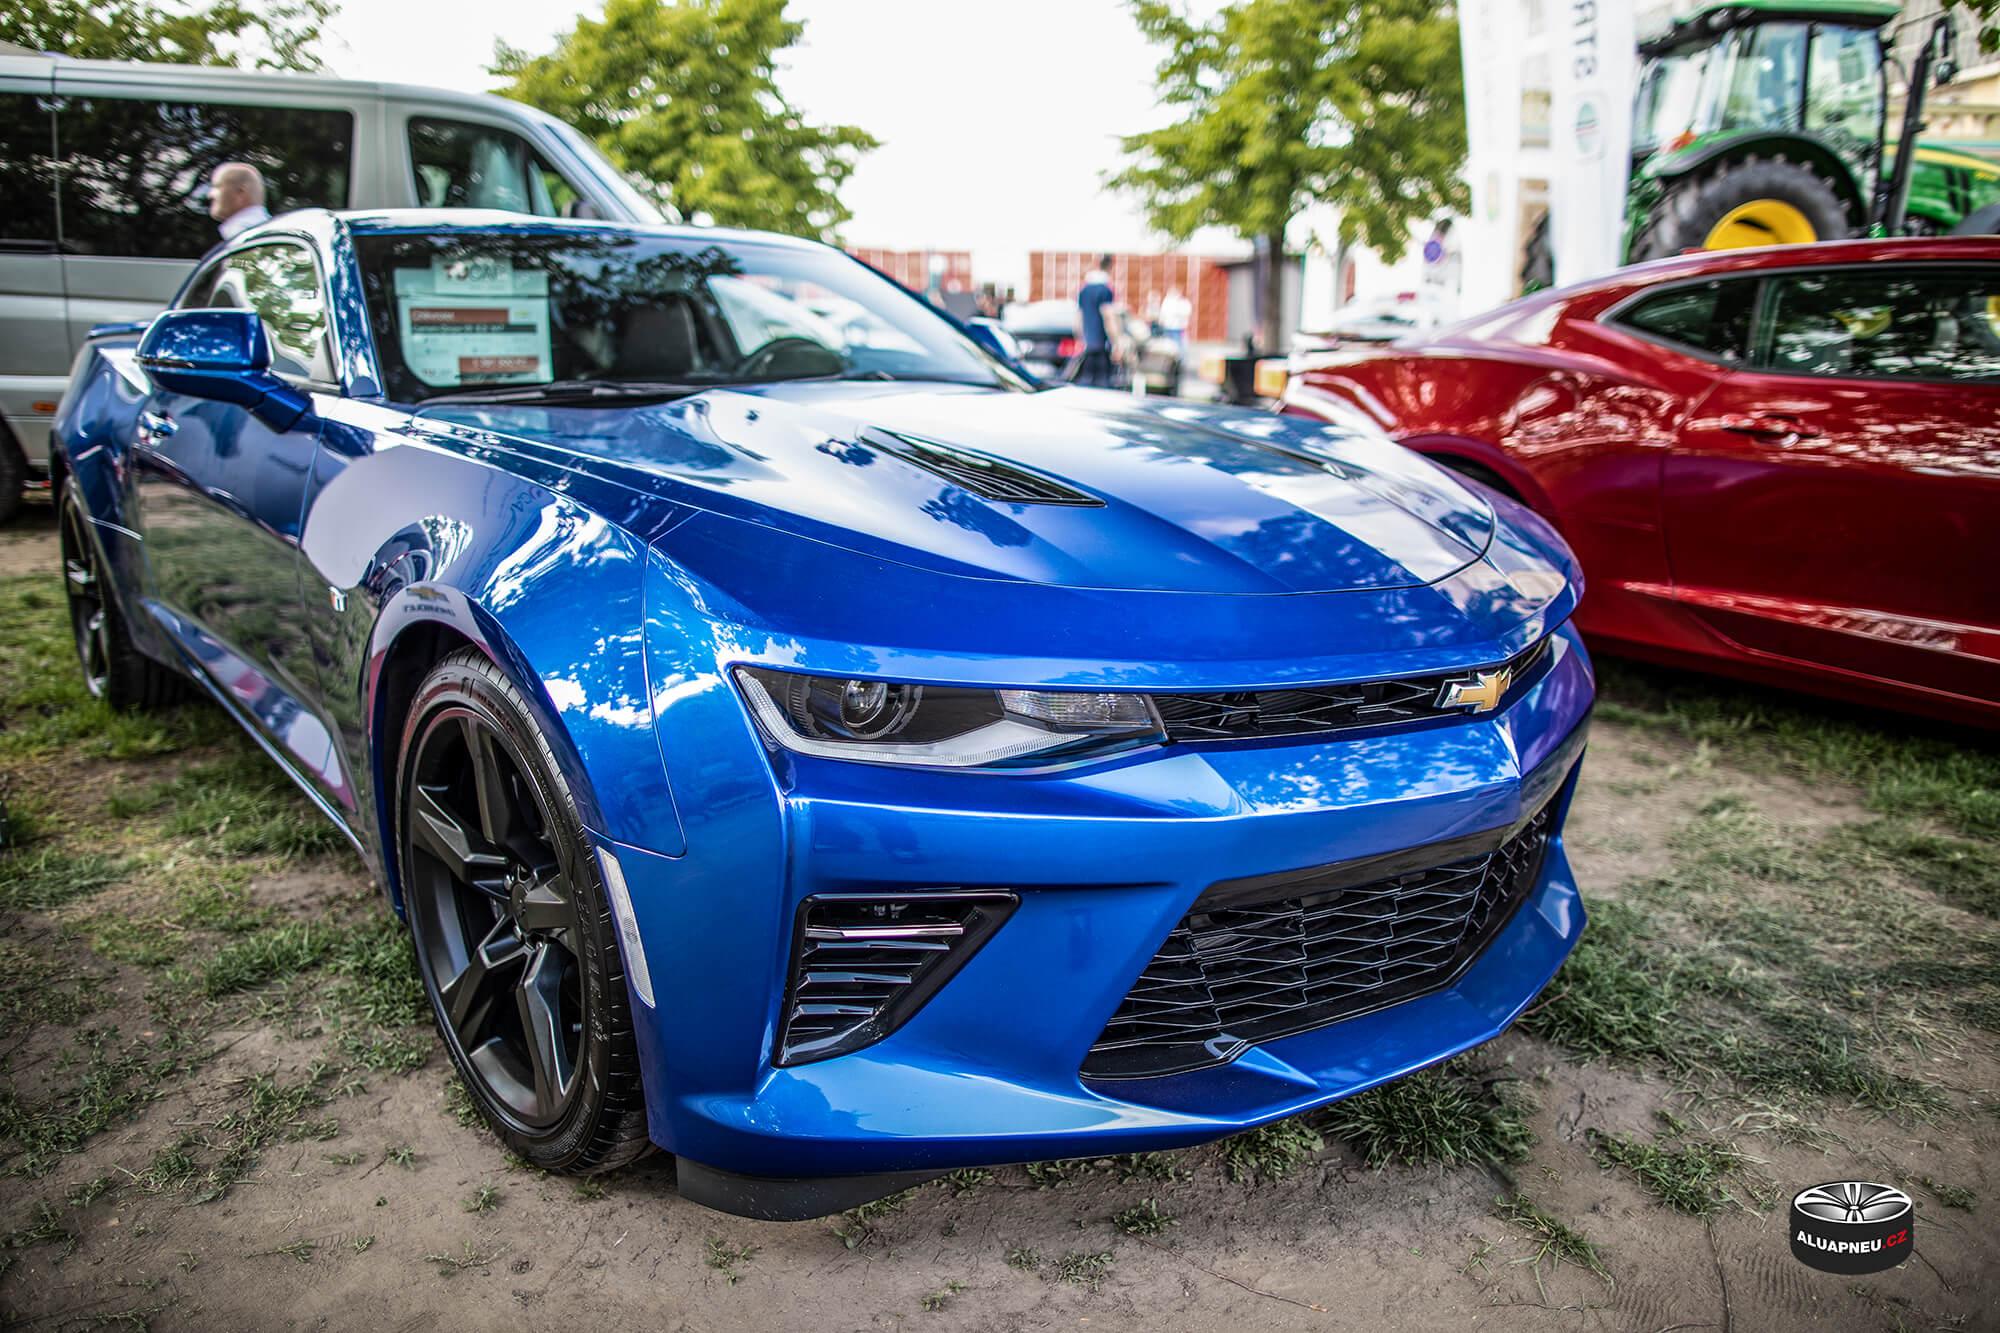 Černá litá kola Chevrolet Camaro - originální elektrony - Automobilové Legendy 2019 - www.aluapneu.cz